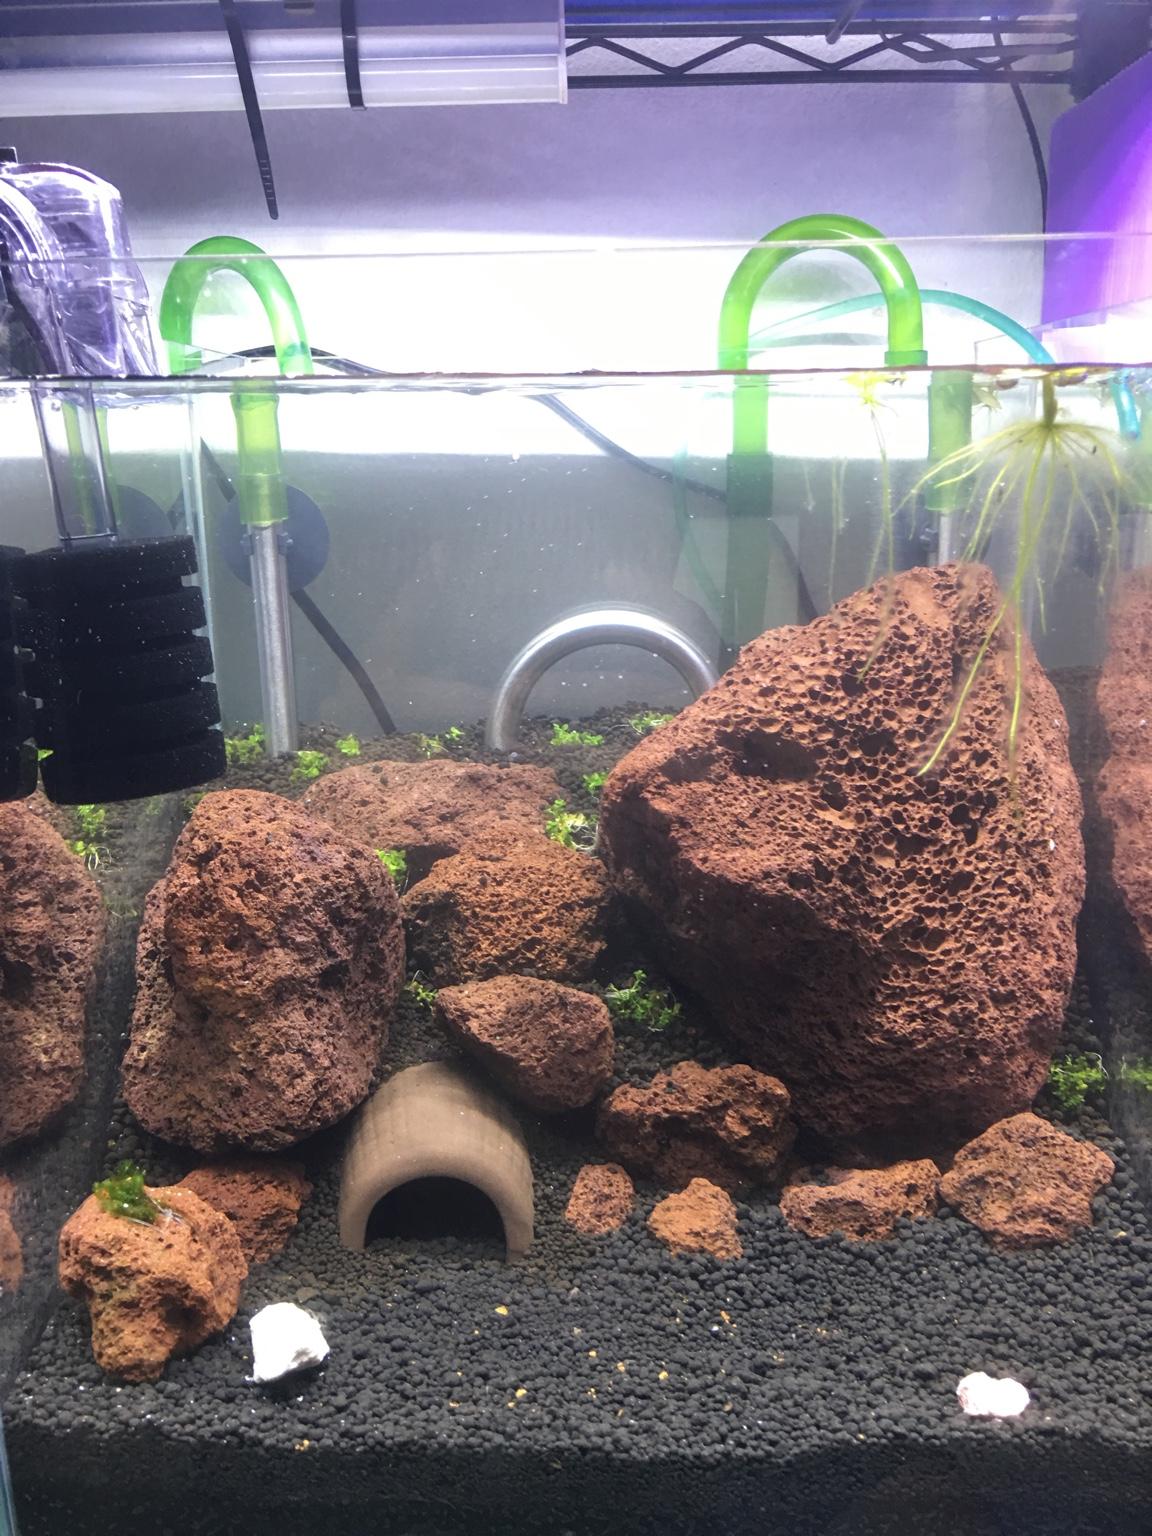 cheapest simple tank neo caridina shrimp set up guide